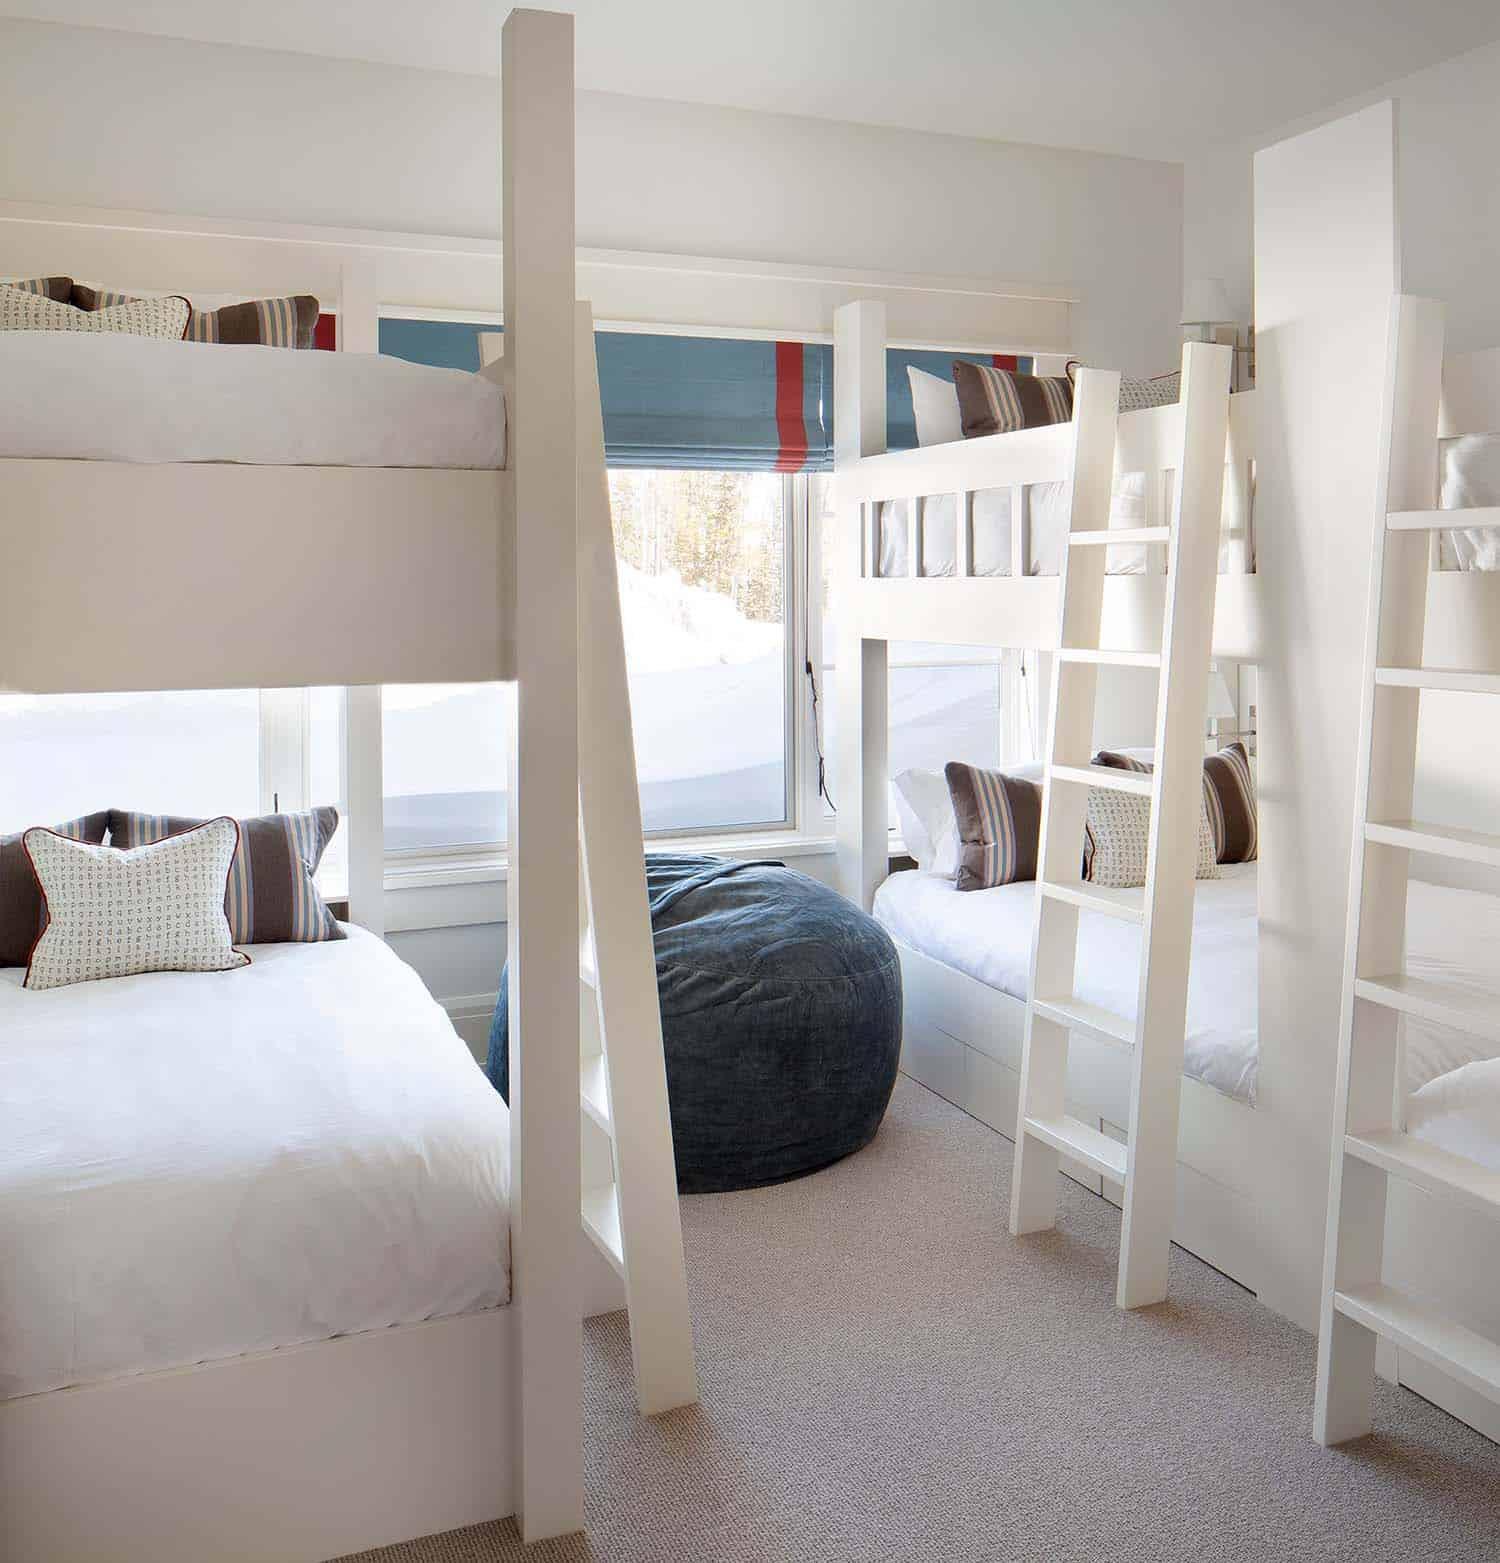 Modern Mountain House-Locati Architects-14-1 Kindesign